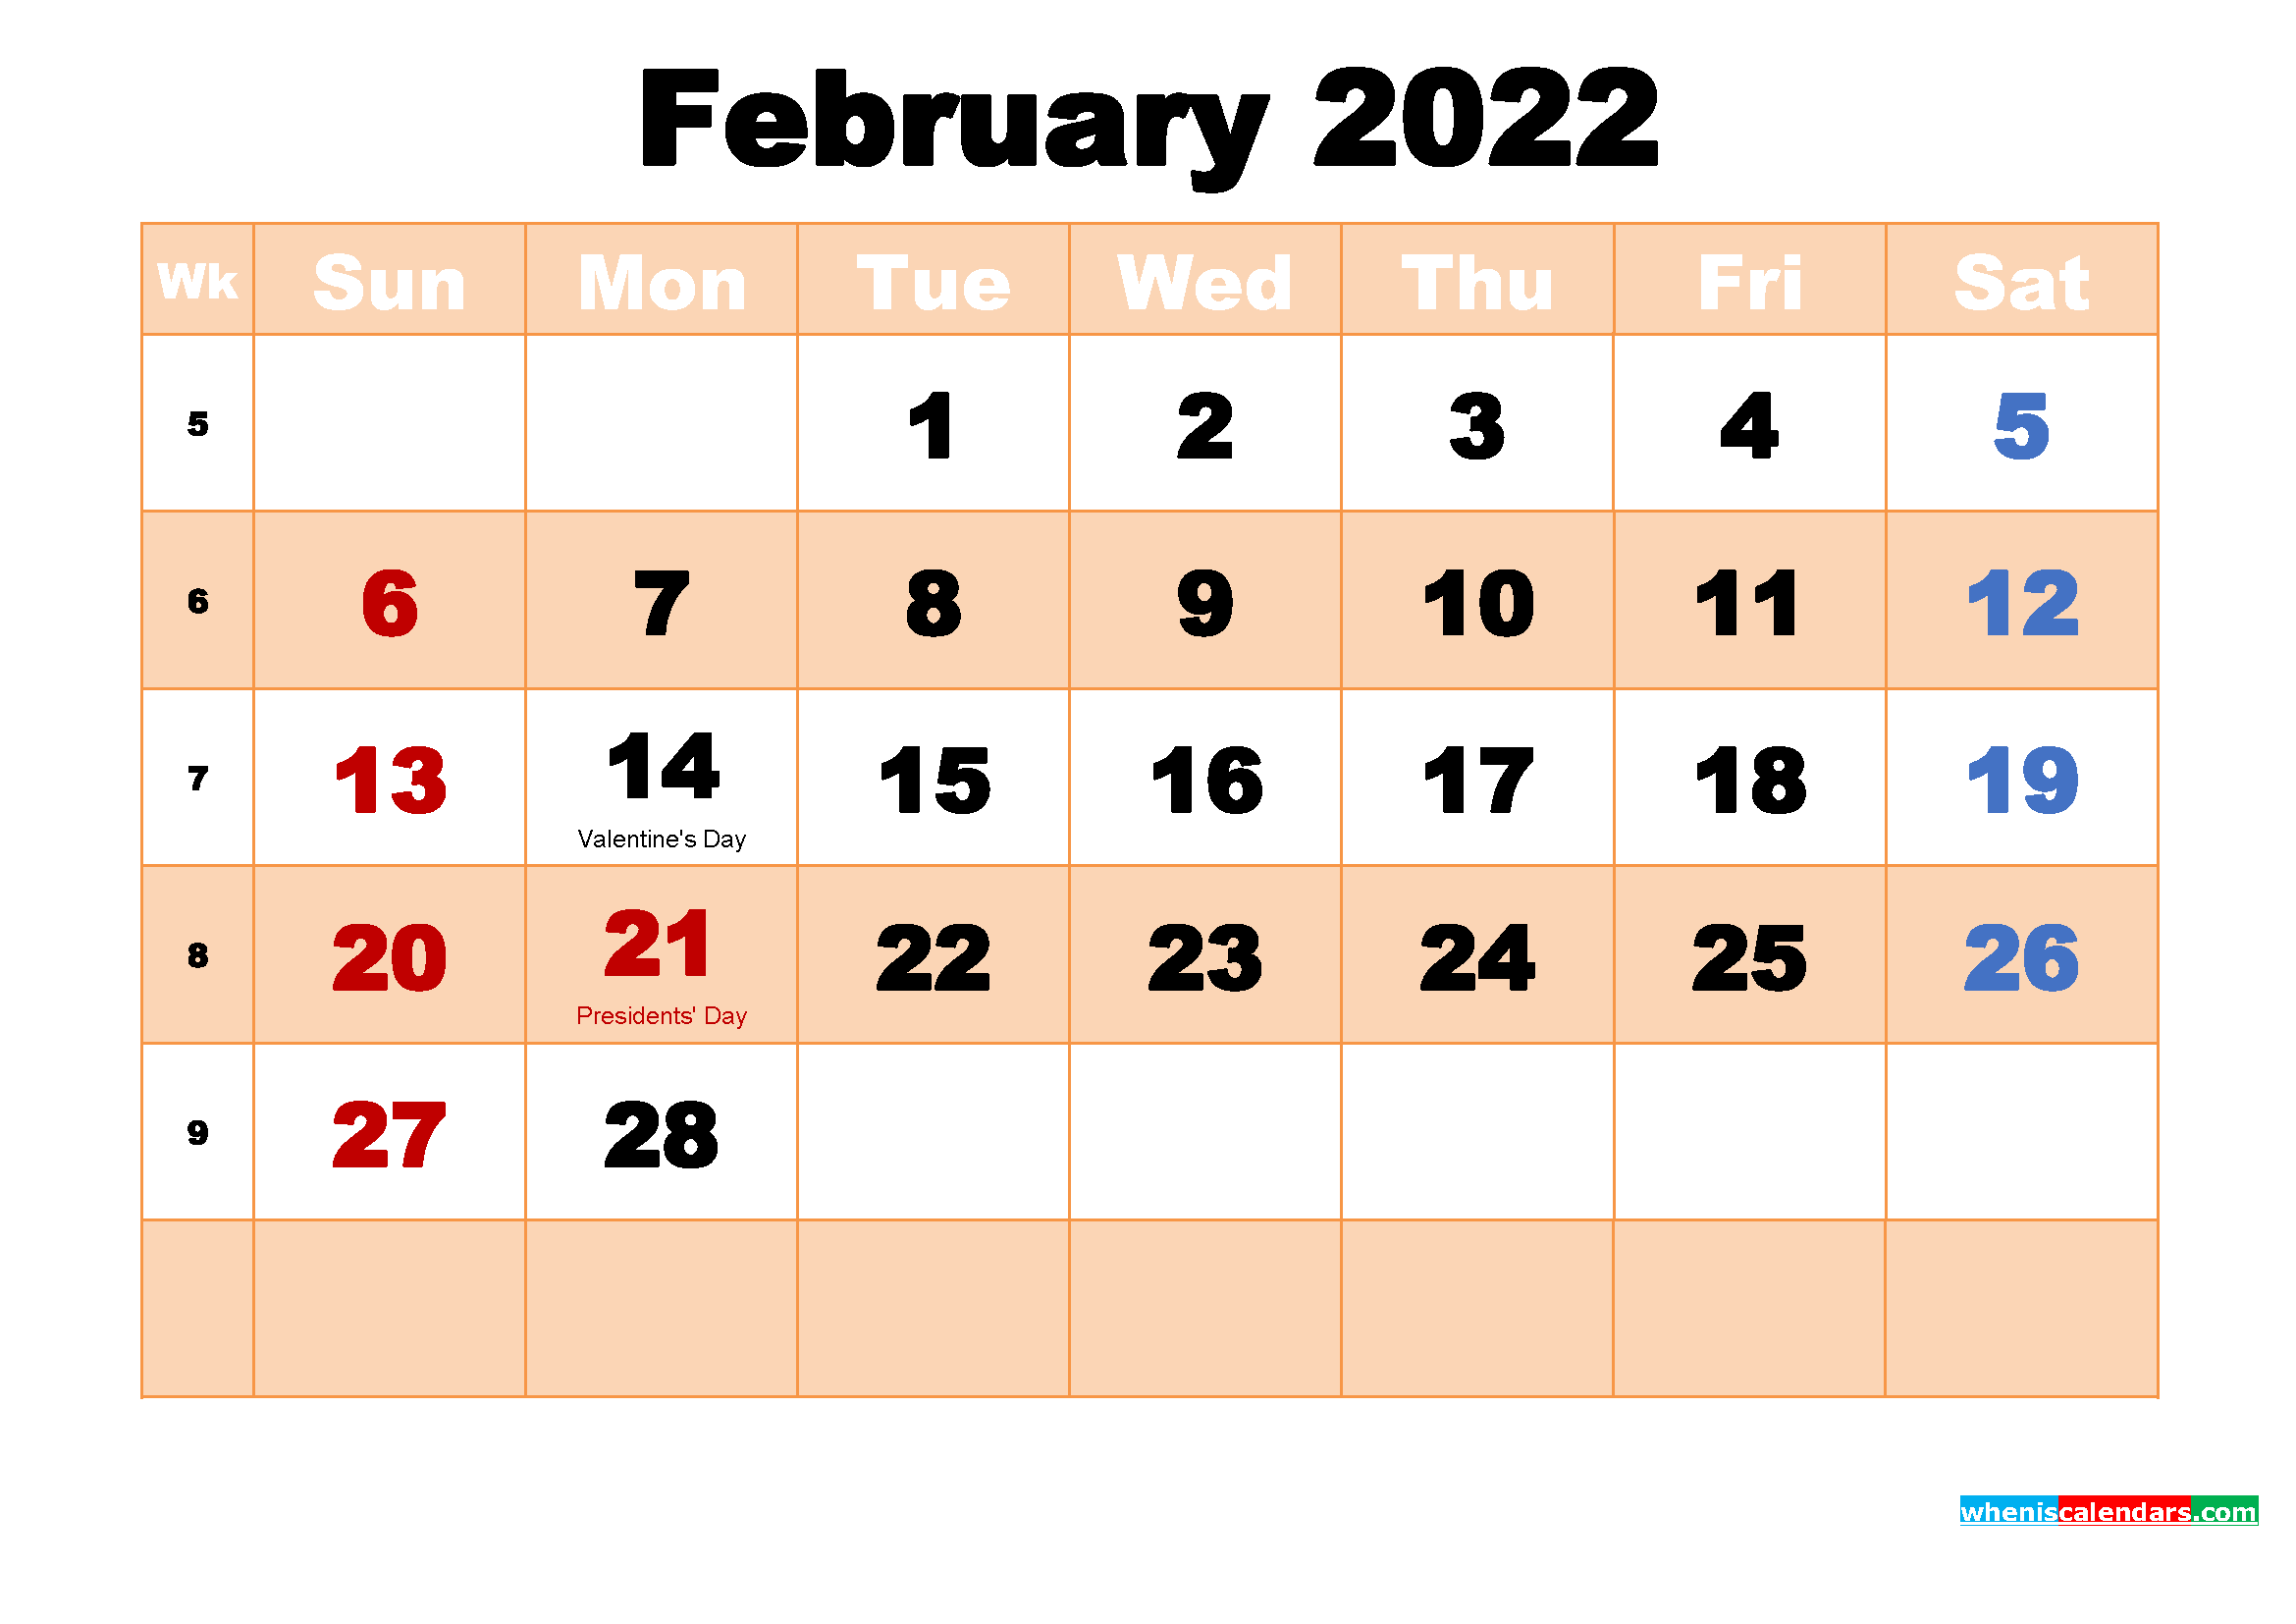 Free Printable February 2022 Calendar With Holidays Regarding Printable February 2022 Calendar